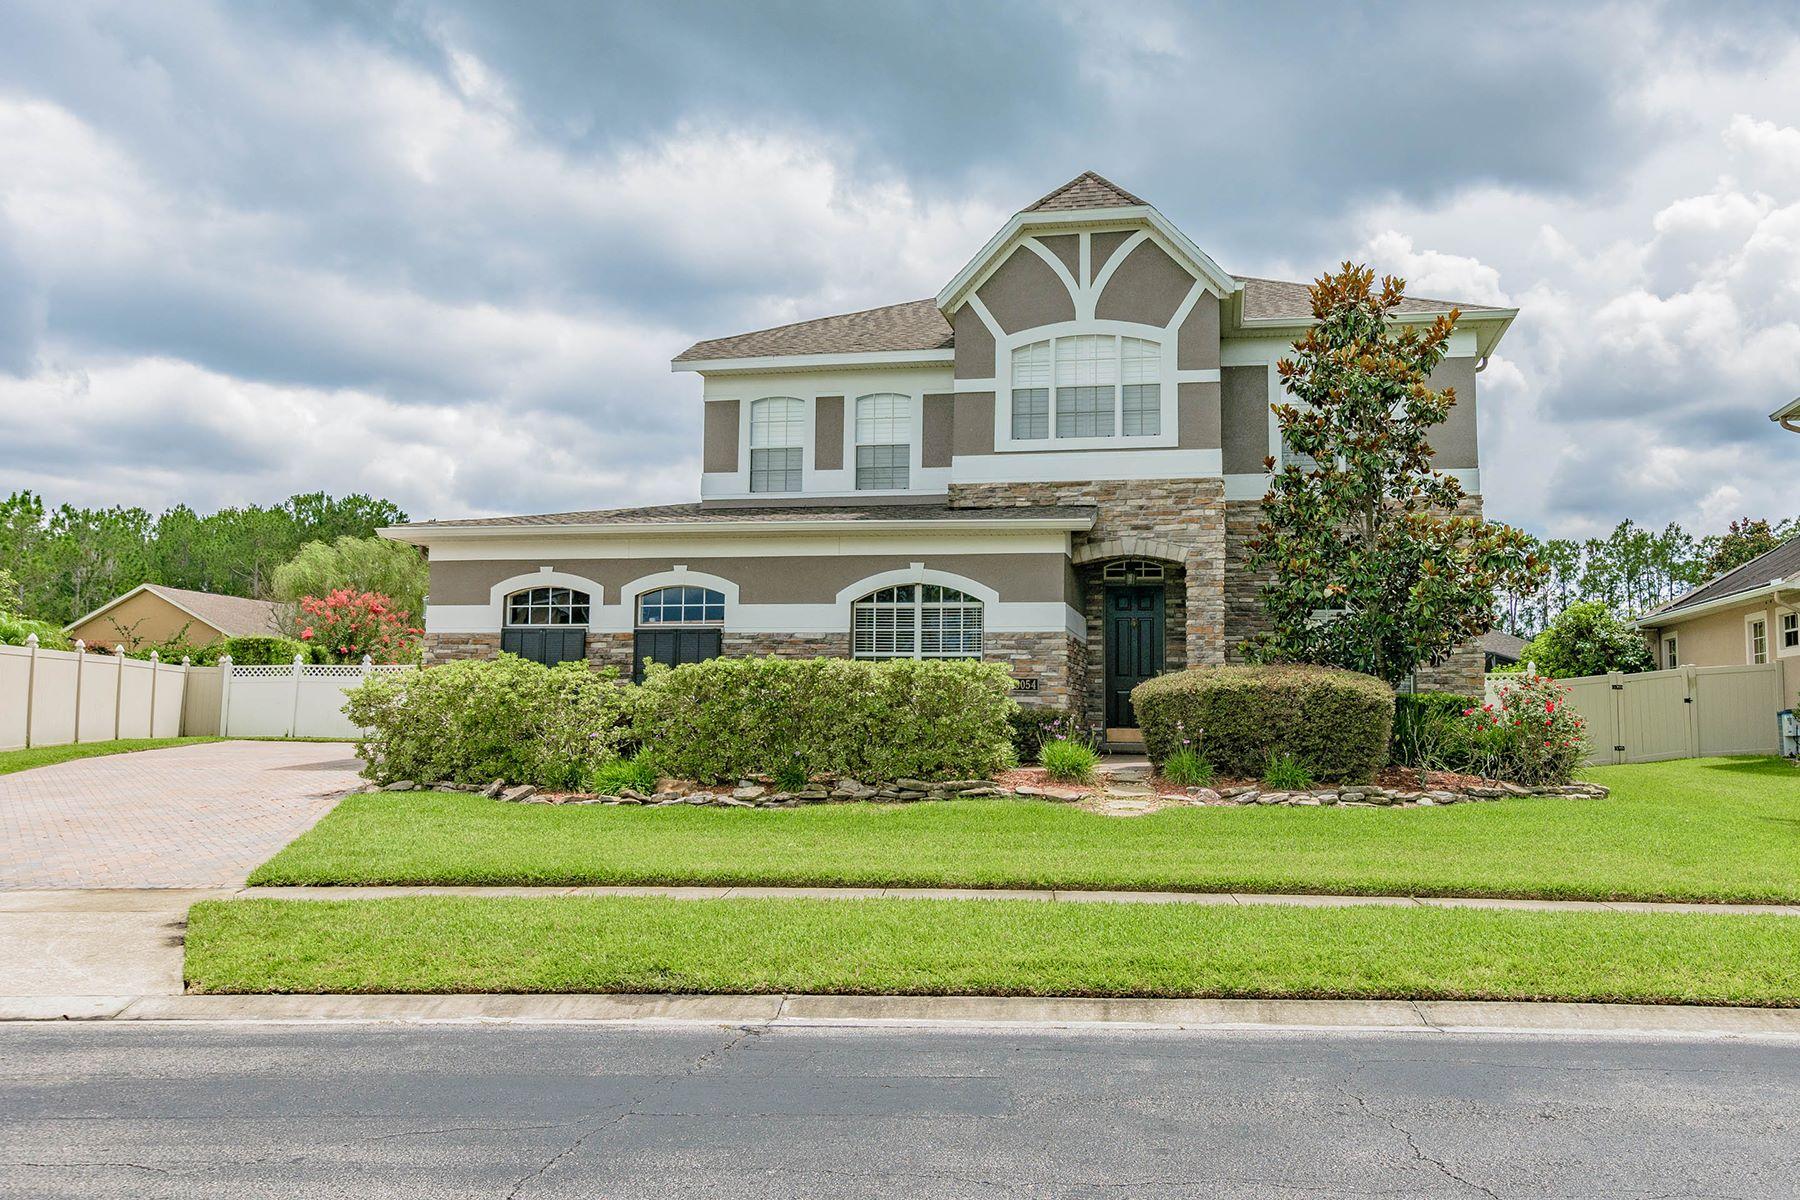 Villa per Vendita alle ore ORLANDO - SANFORD 5054 Otters Den Trl Sanford, Florida 32771 Stati Uniti